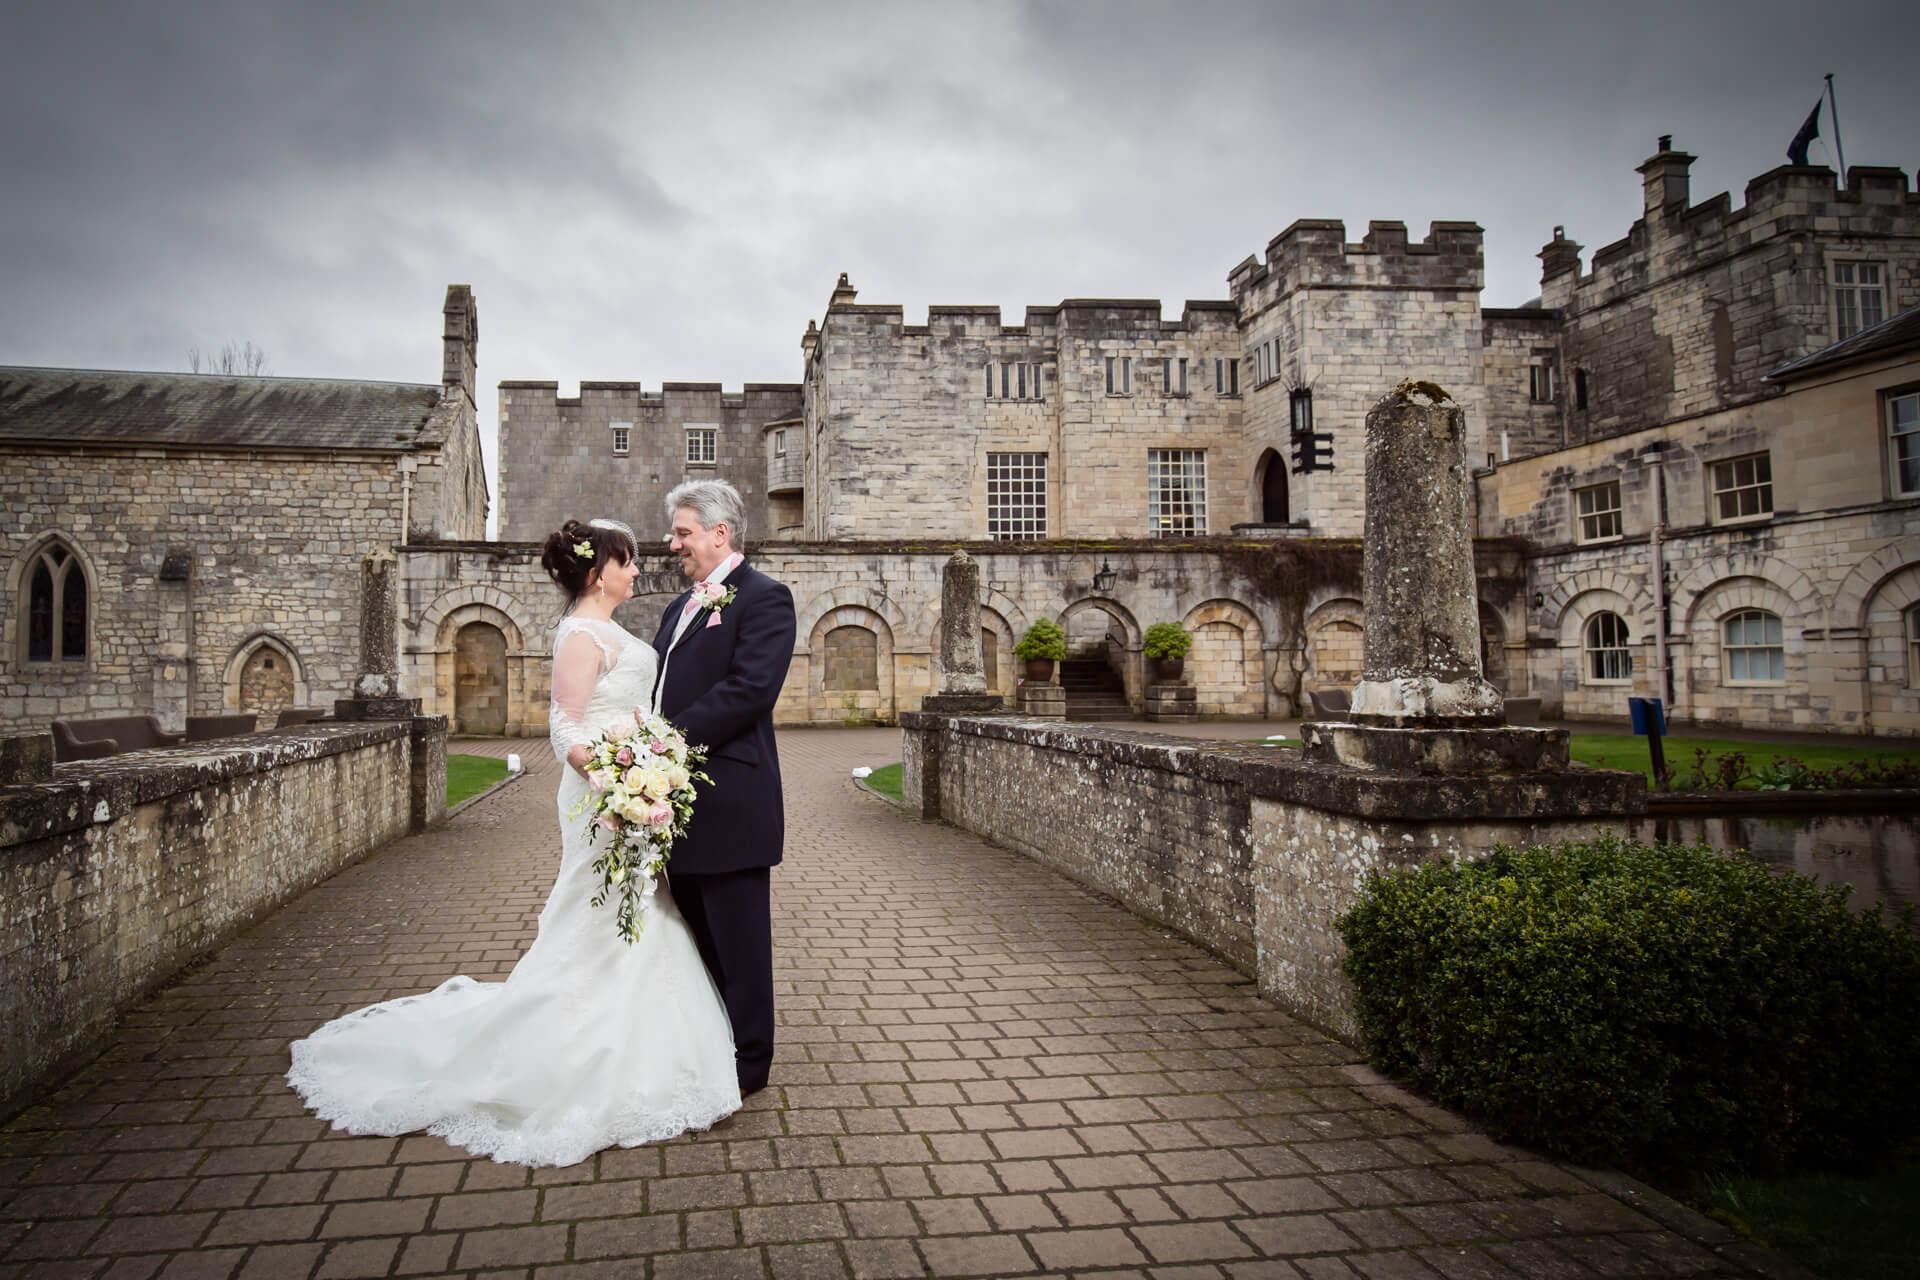 Bride and groom outside Hazlewood Castle